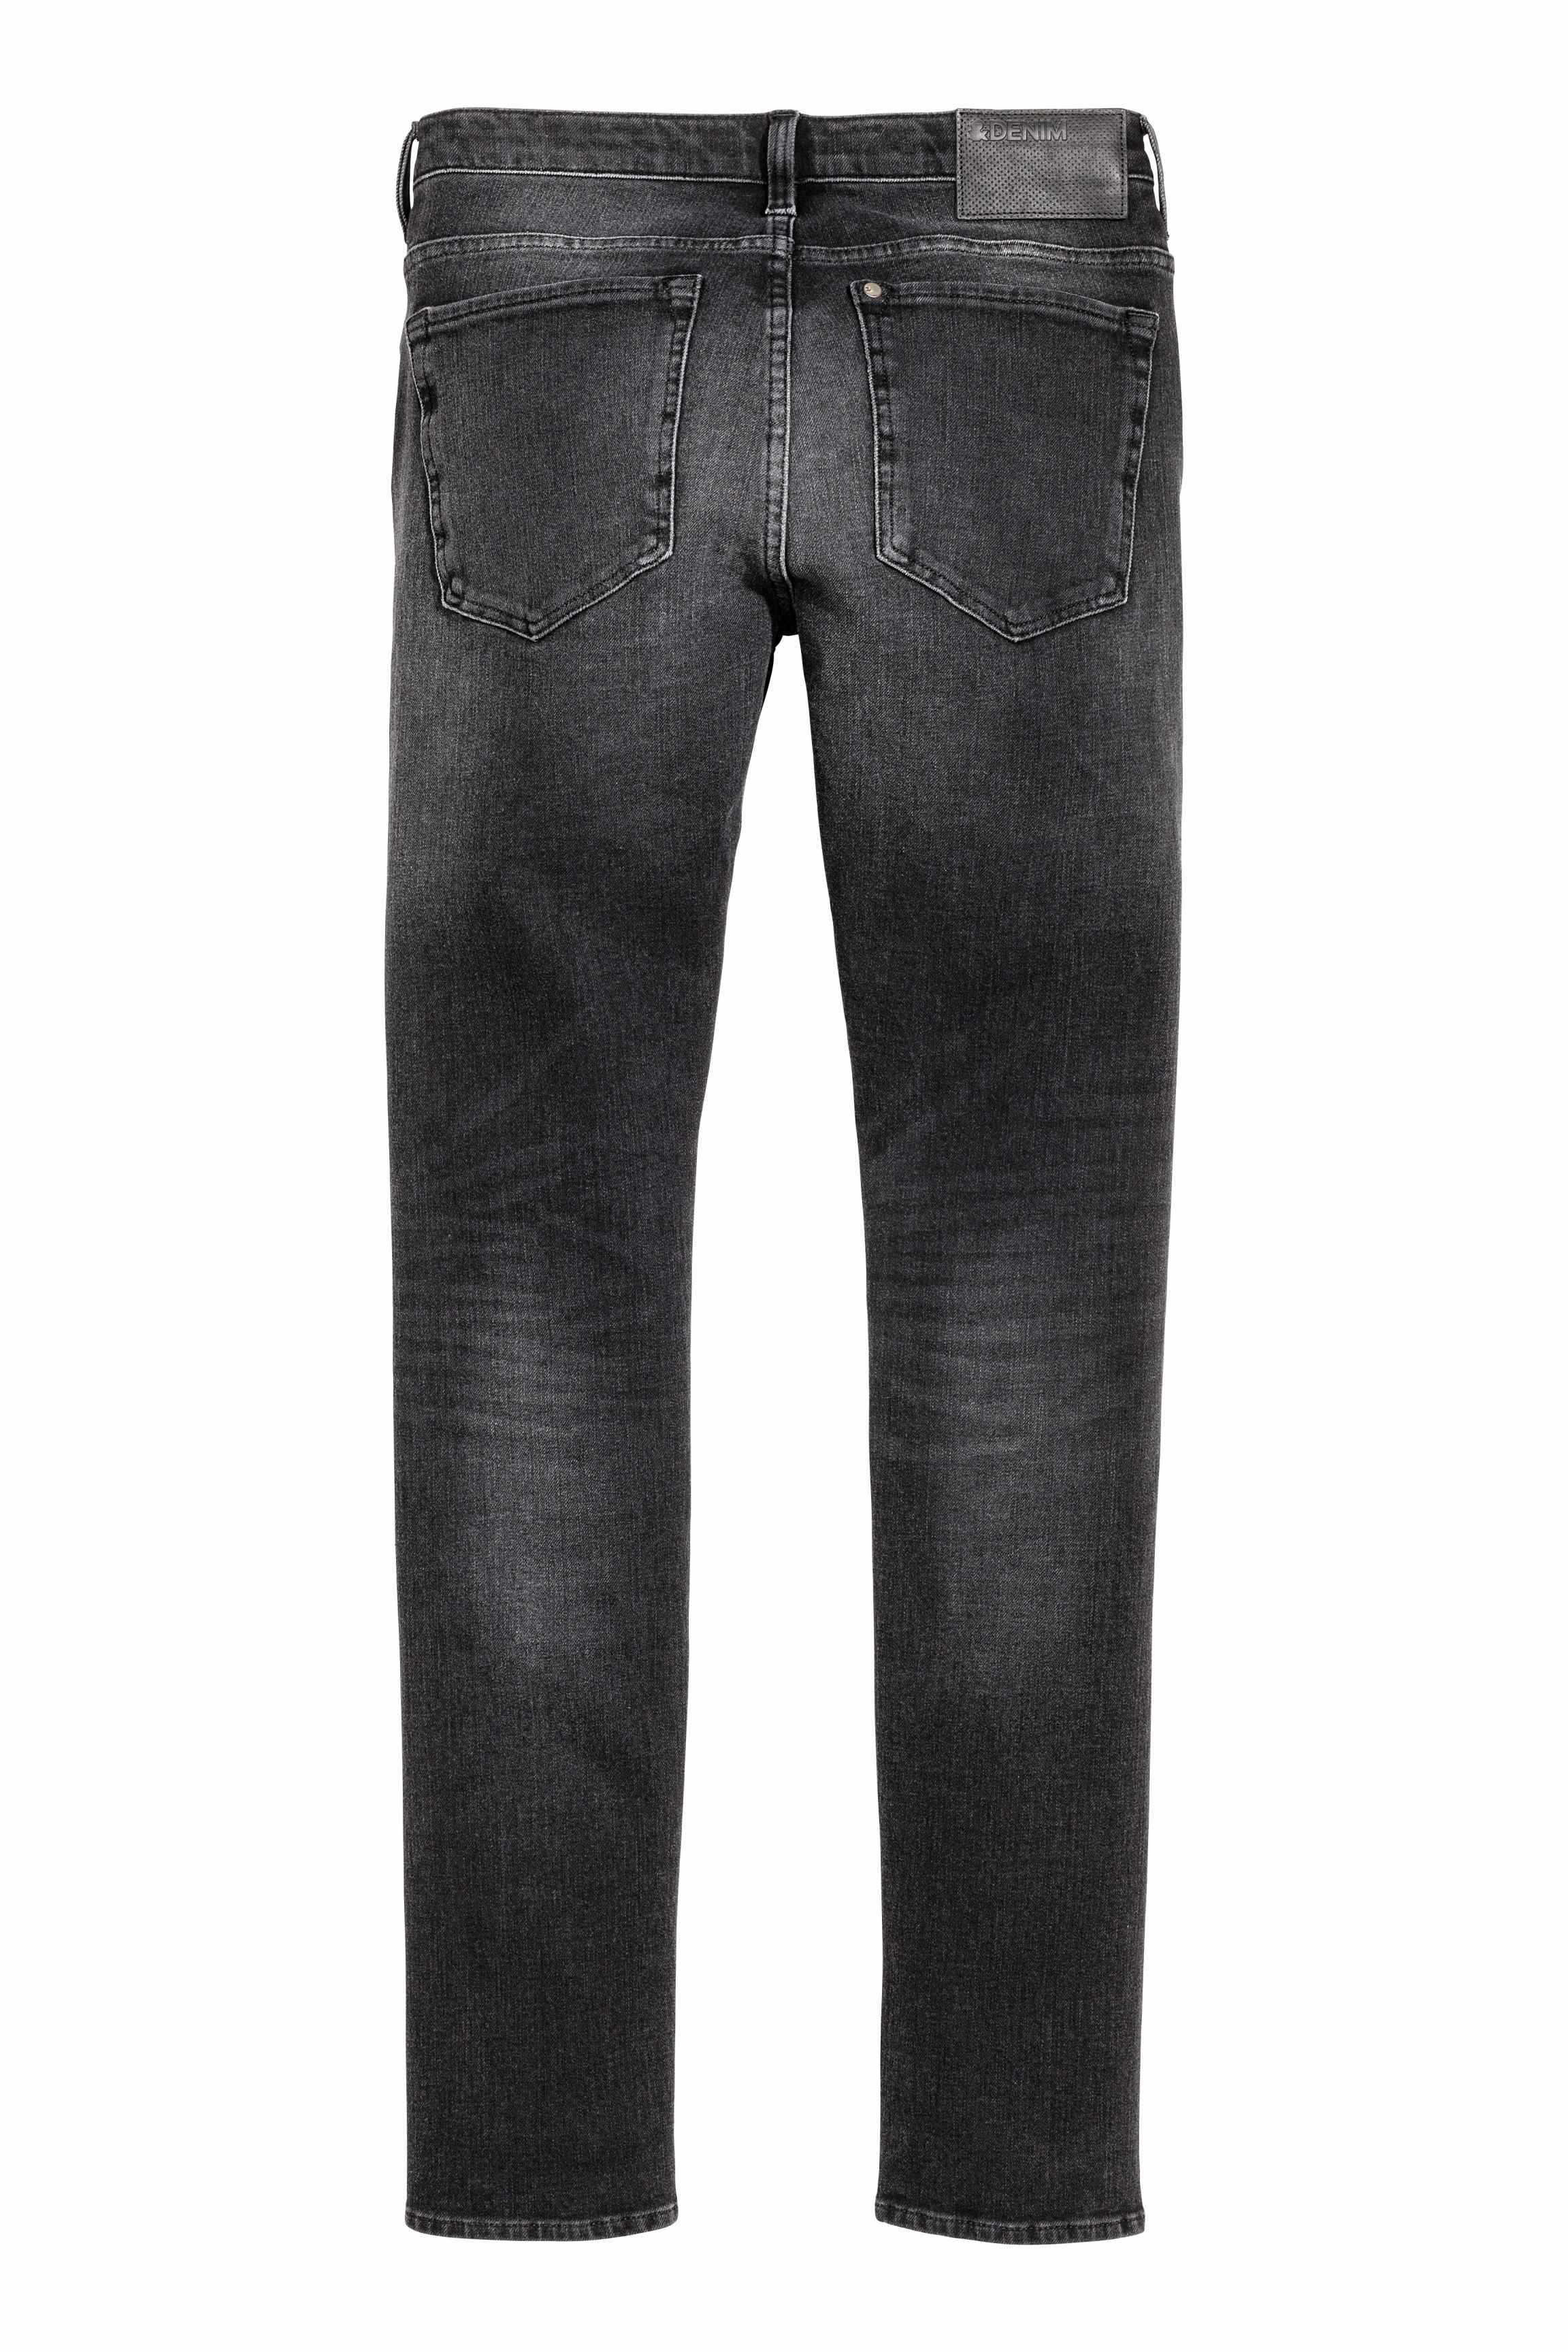 H&M Denim 360 Tech Stretch Skinny Jeans in Black for Men